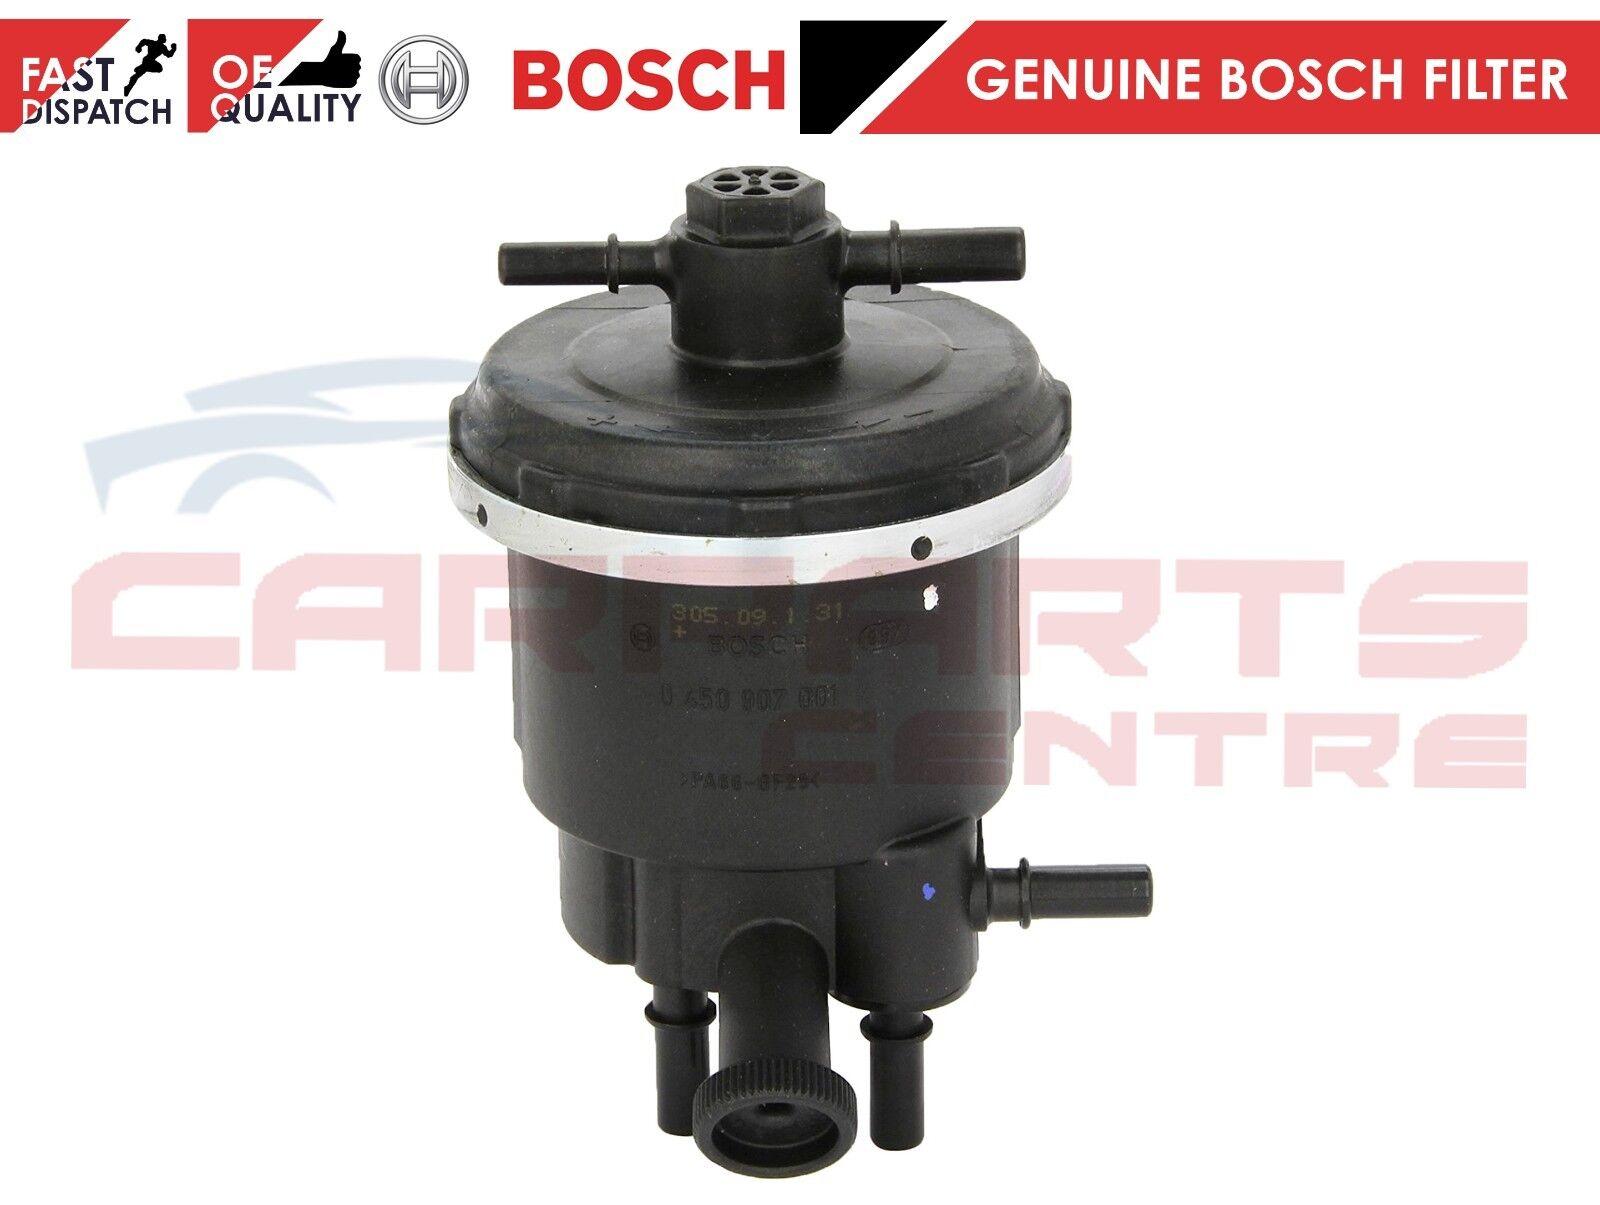 Bosch Fuel Filter Fits Fiat Scudo 2.0 D 5 Year Warranty Brand New Mk2